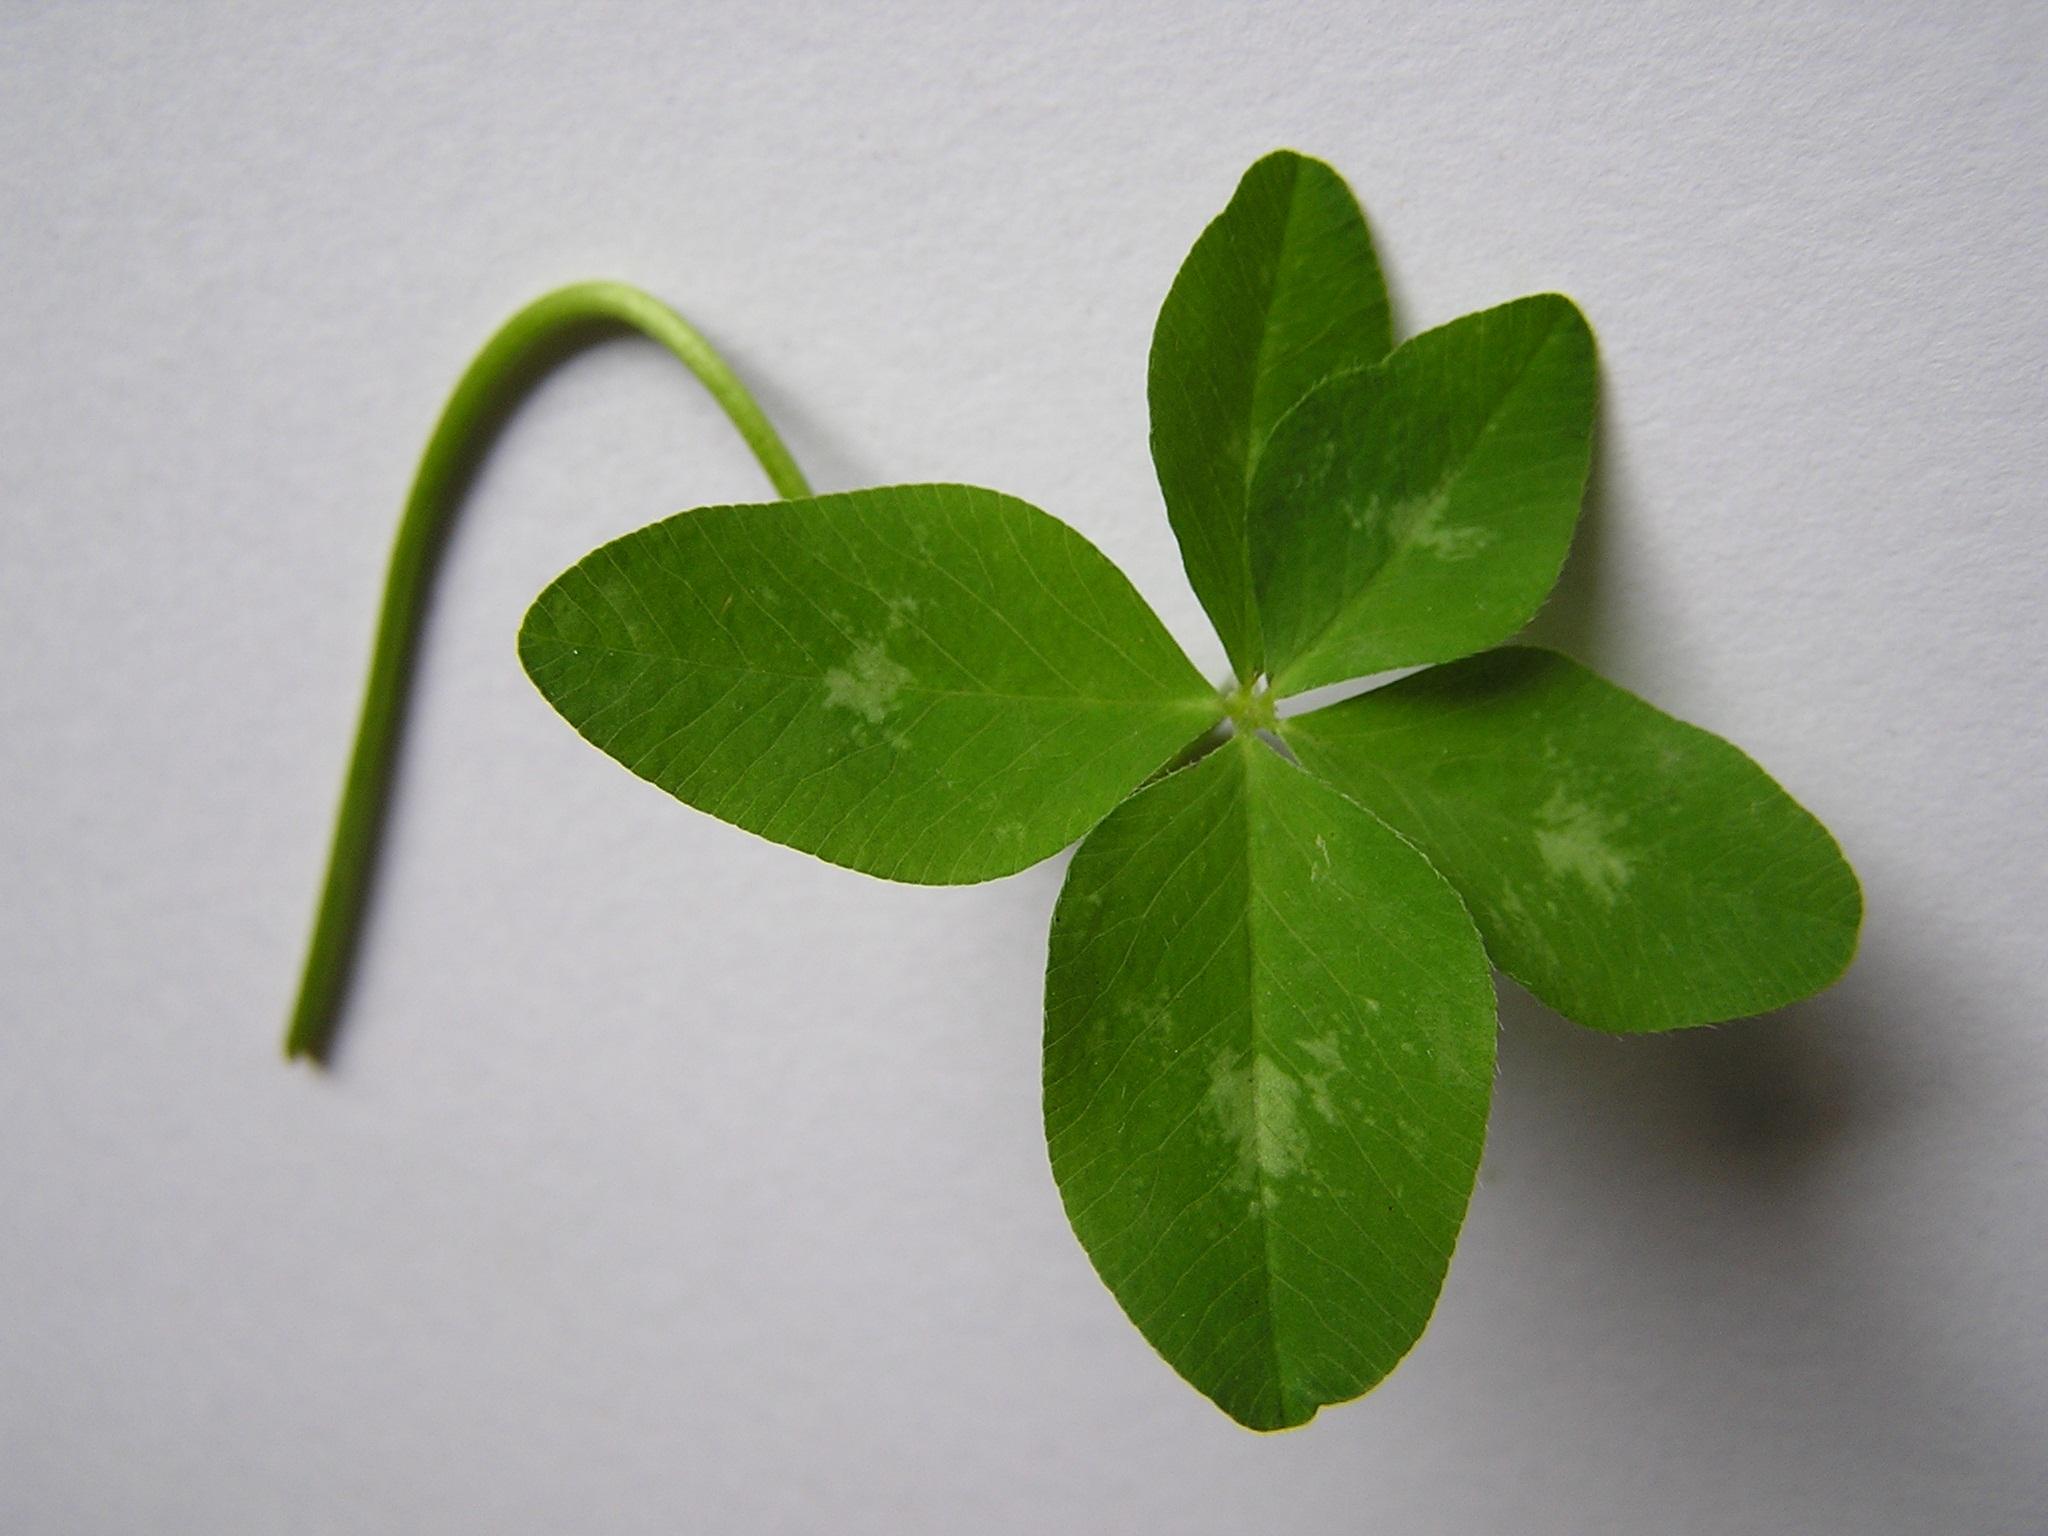 FileFive Leaf Clover Trifolium MediumJPG